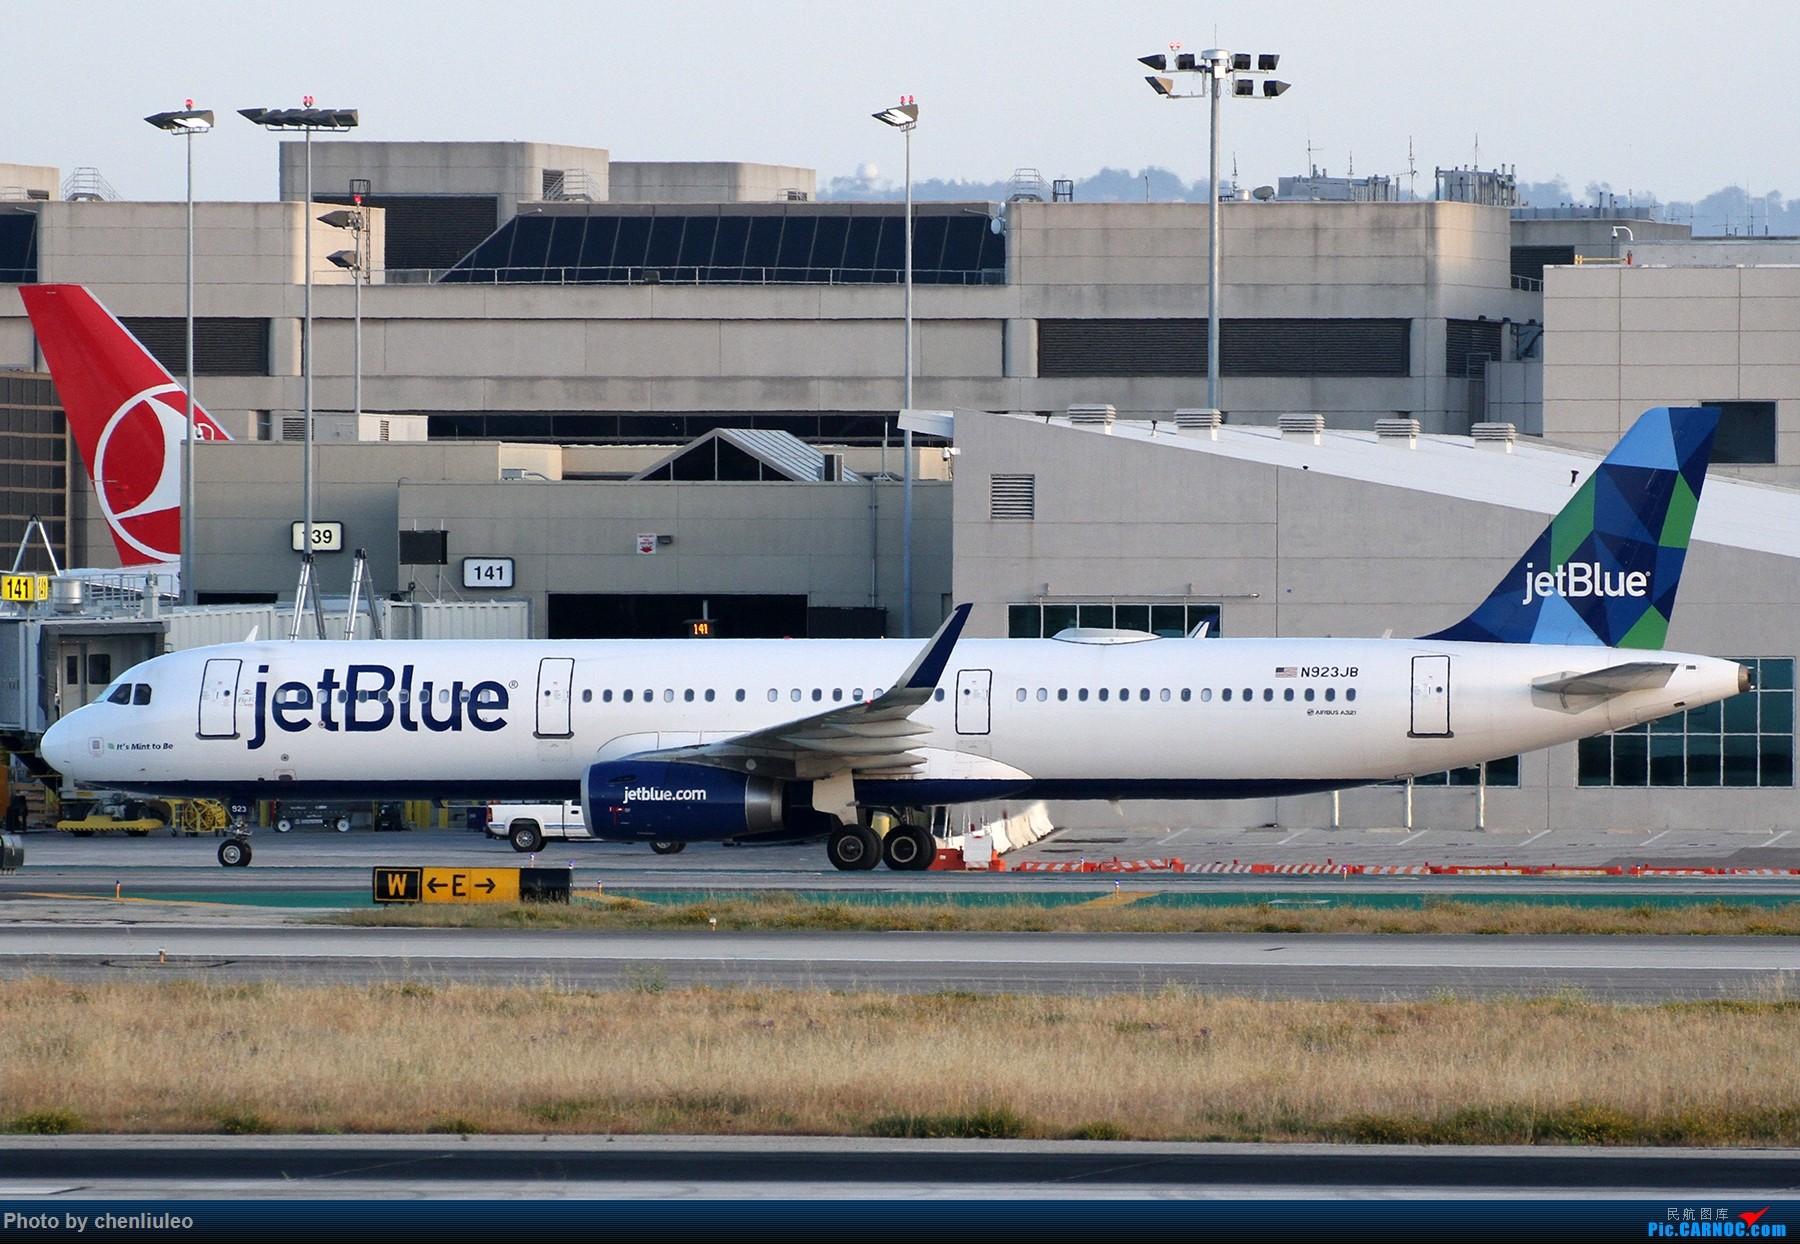 Re:[原创]【北美飞友会】洛杉矶世界机场黄昏随拍 AIRBUS A321-200 N923JB 美国洛杉矶机场